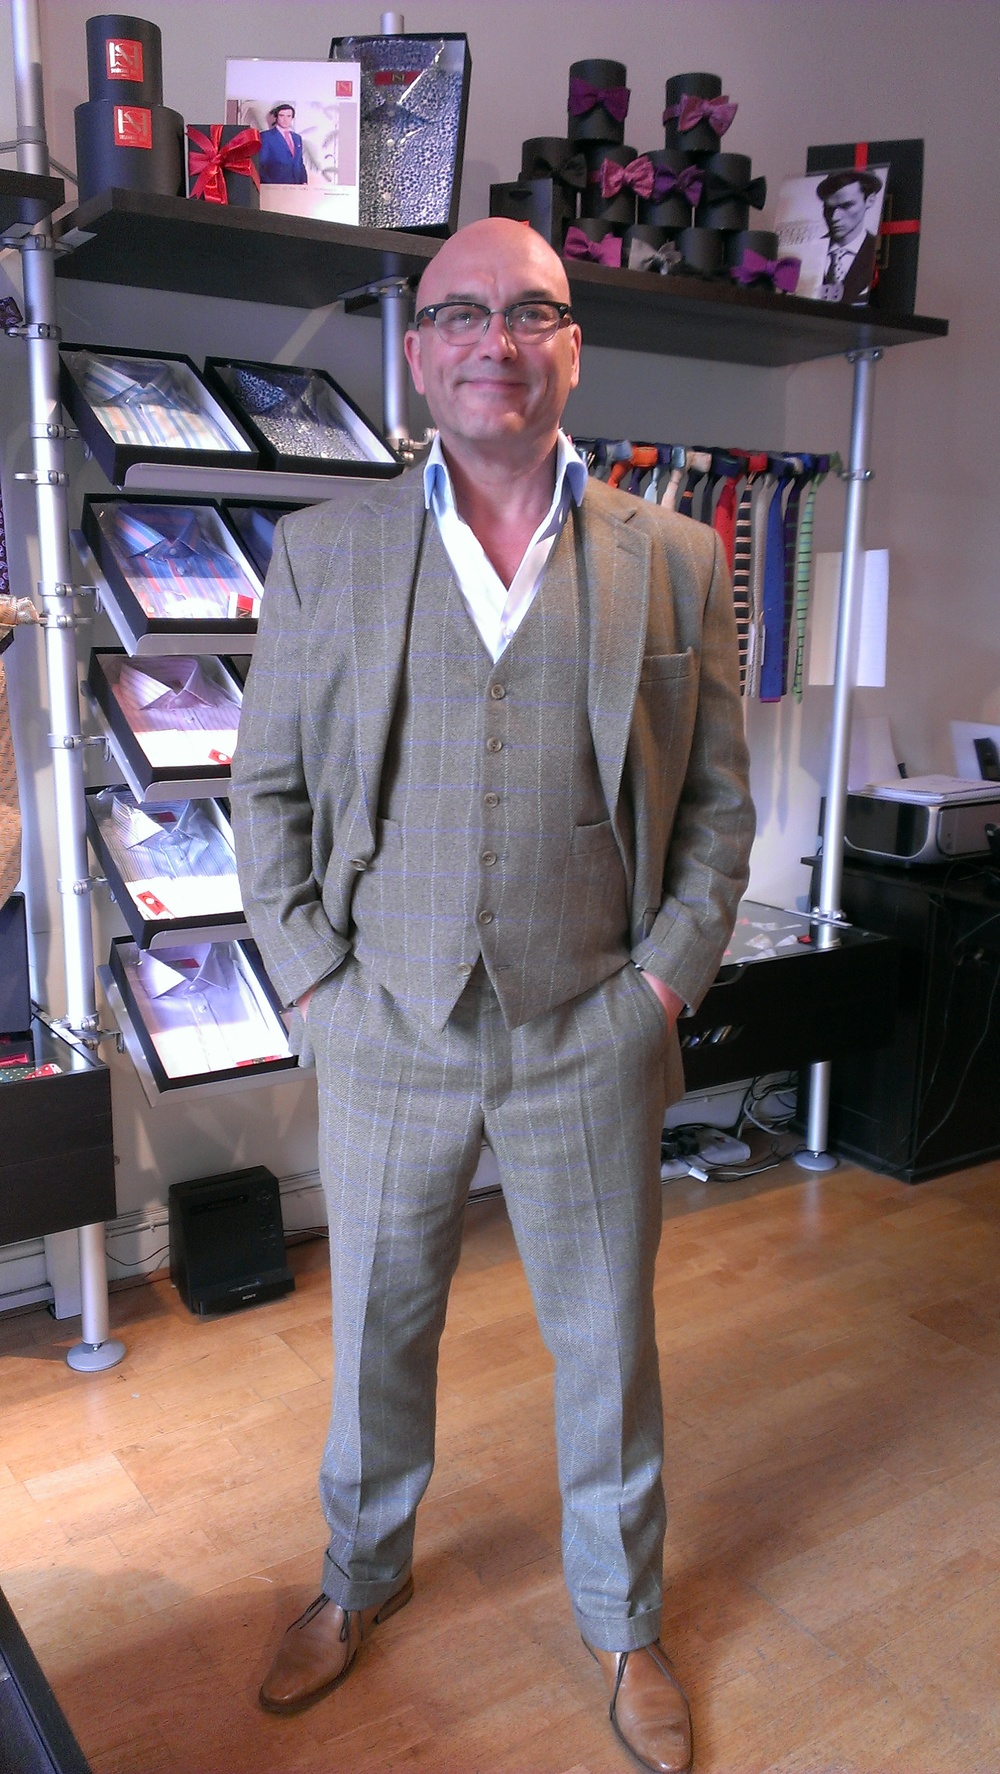 gregg-wallace-three-piece-tweed-suit-bespoke-all-uk-made.jpg